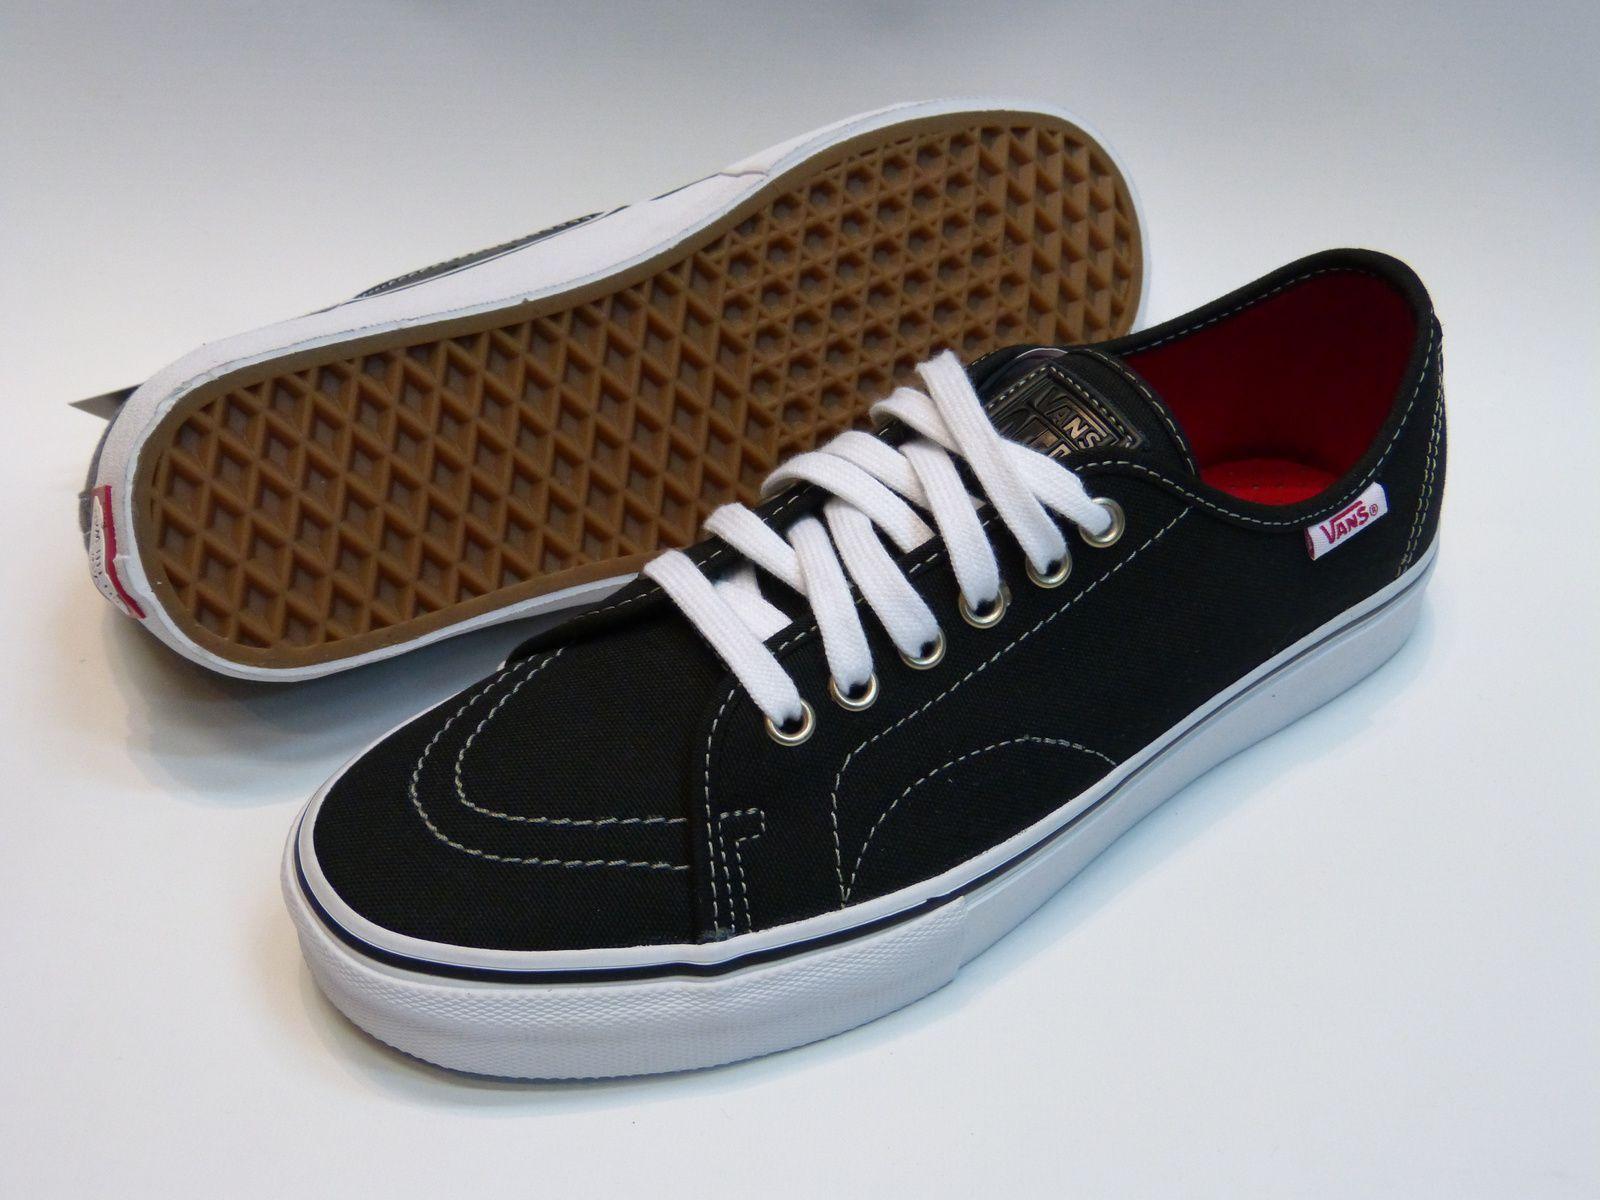 Vans Pro Skate &amp&#x3B; Anti-Hero part 2